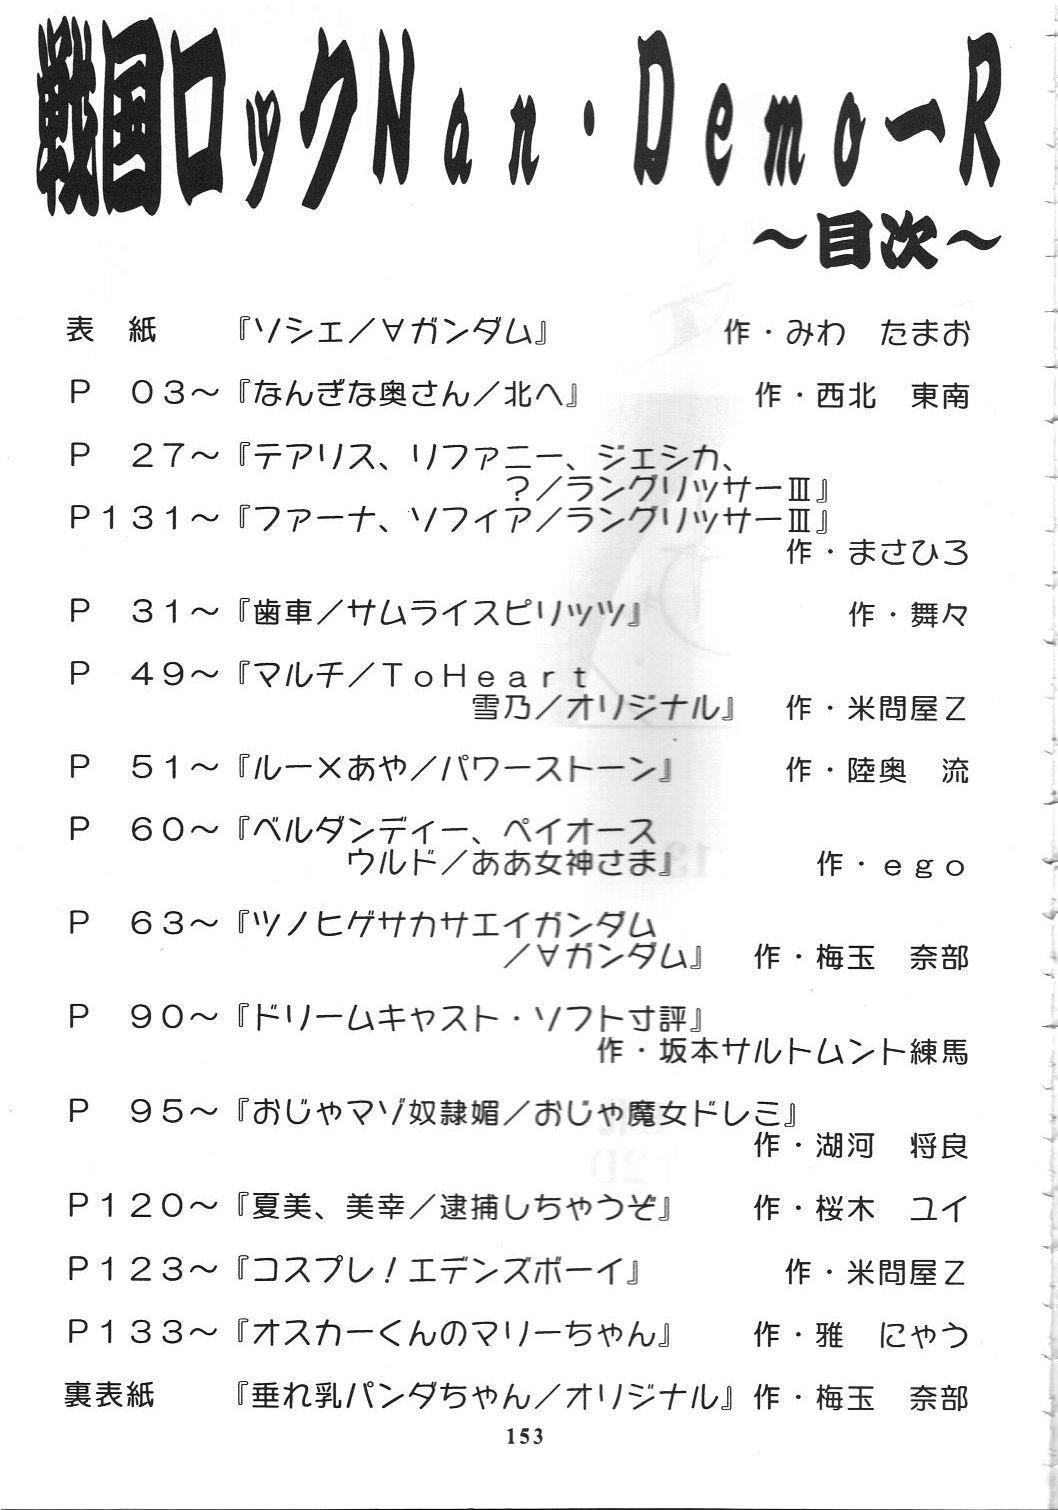 (C56) [Tsurikichi Doumei (Various)] Sengoku Rock - Nan Demo-R (Various) 154